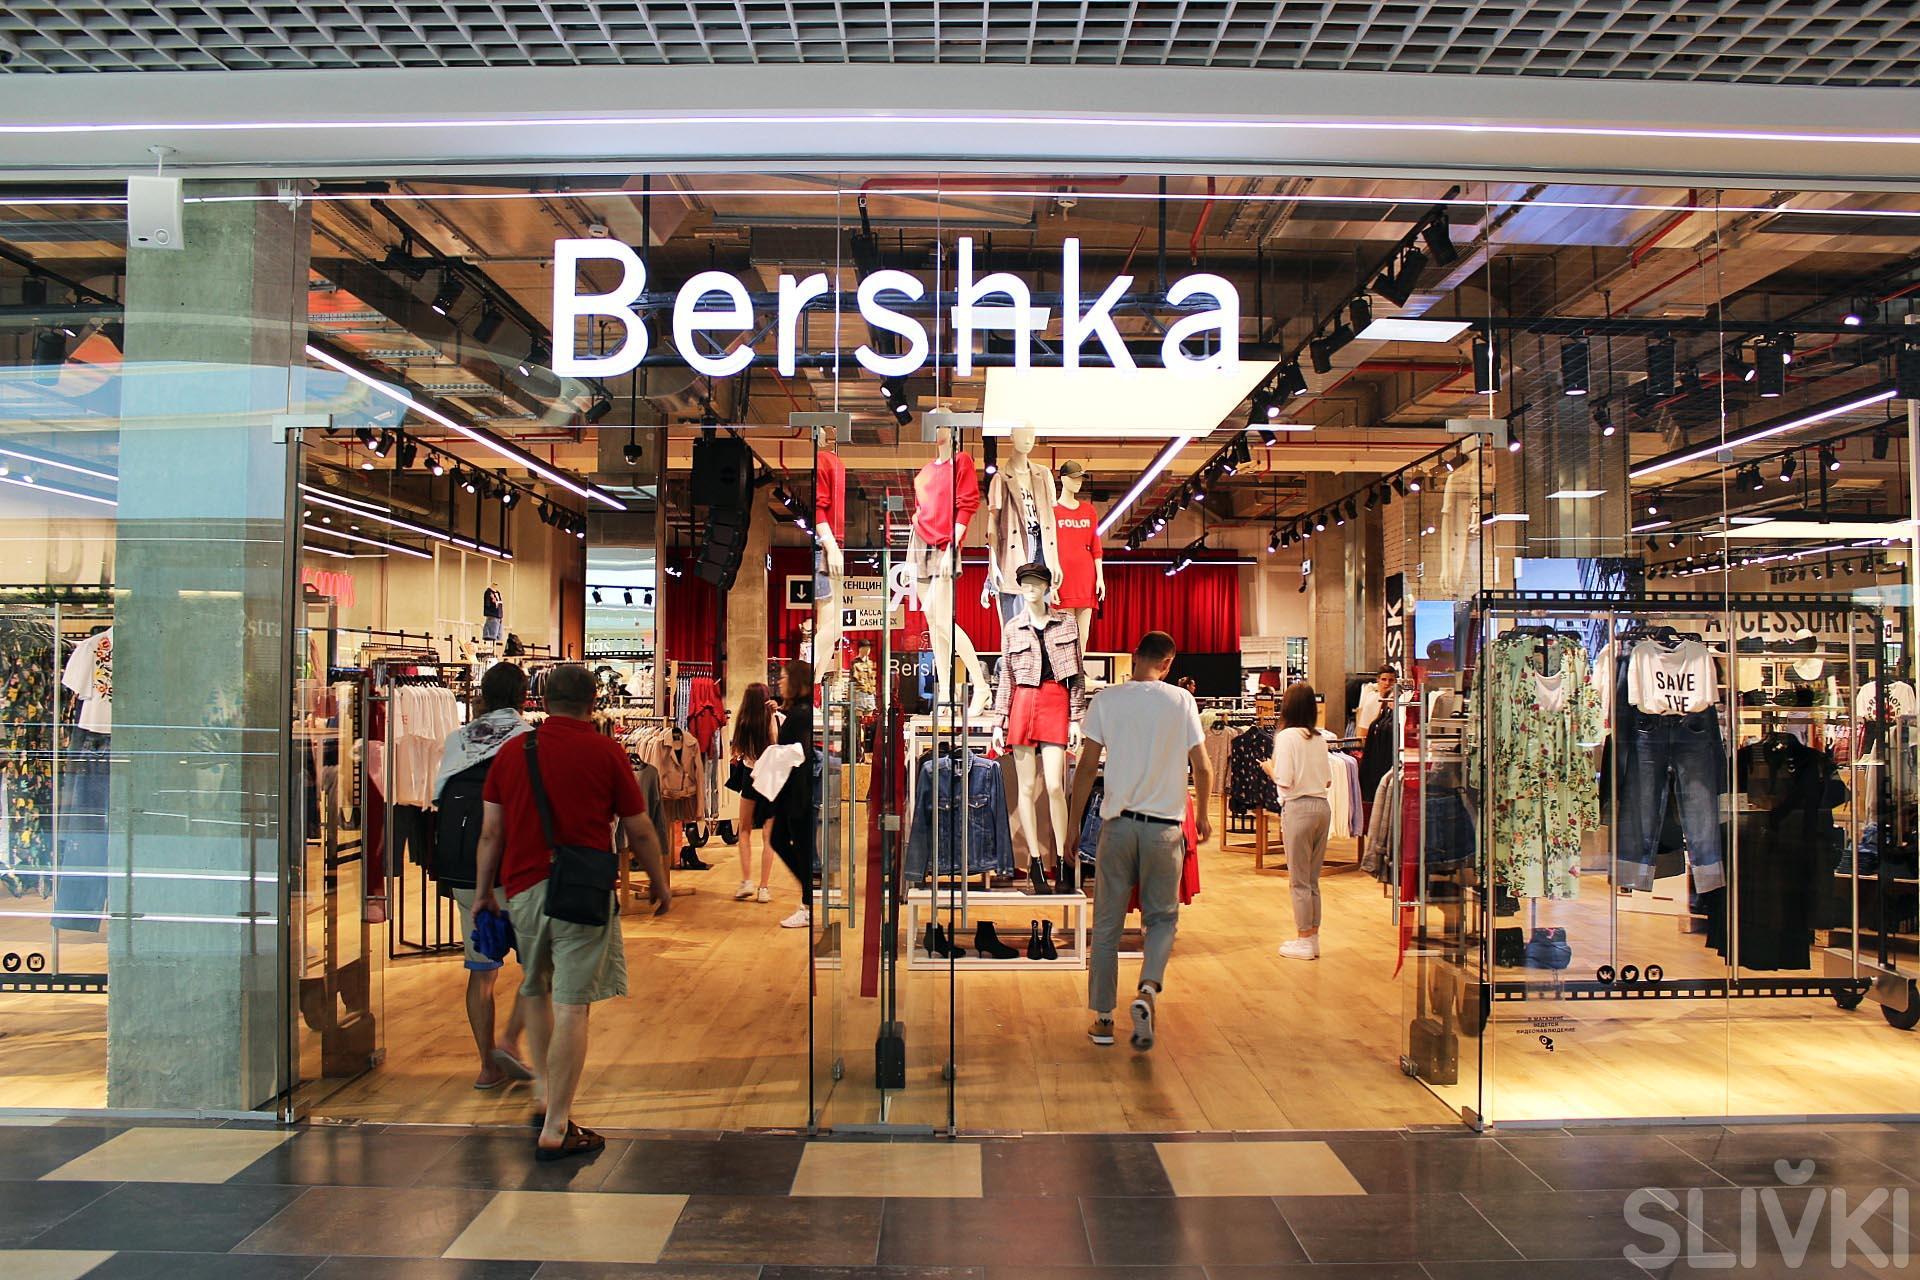 В Минске открылась Bershka! Фото + цены